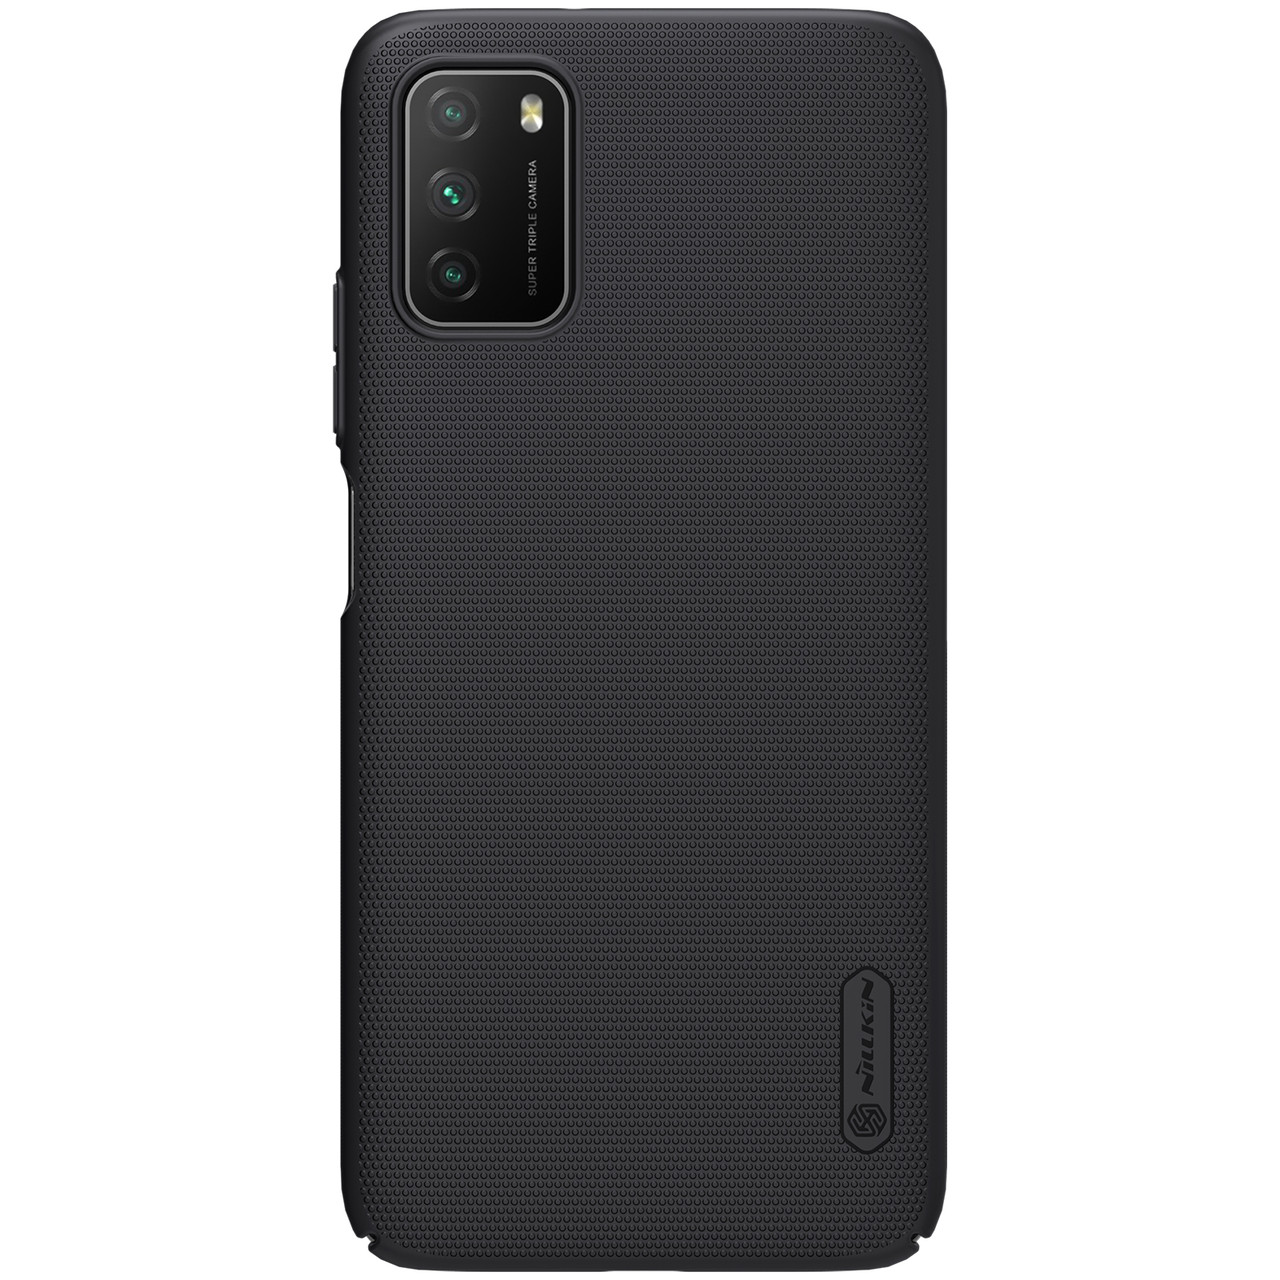 Захисний чохол Nillkin для Xiaomi Poco M3 Super Frosted Shield Black Чорний